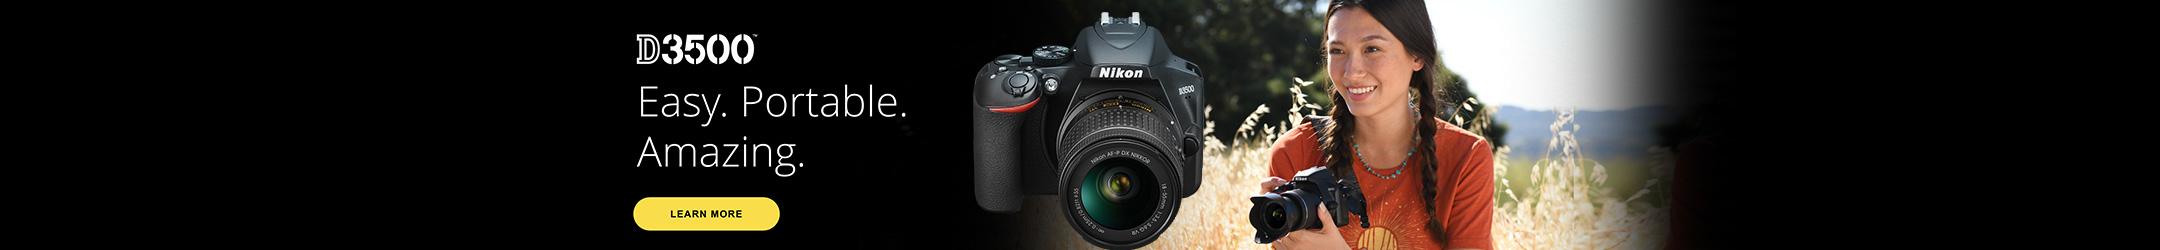 Compare DSLR Cameras | Nikon